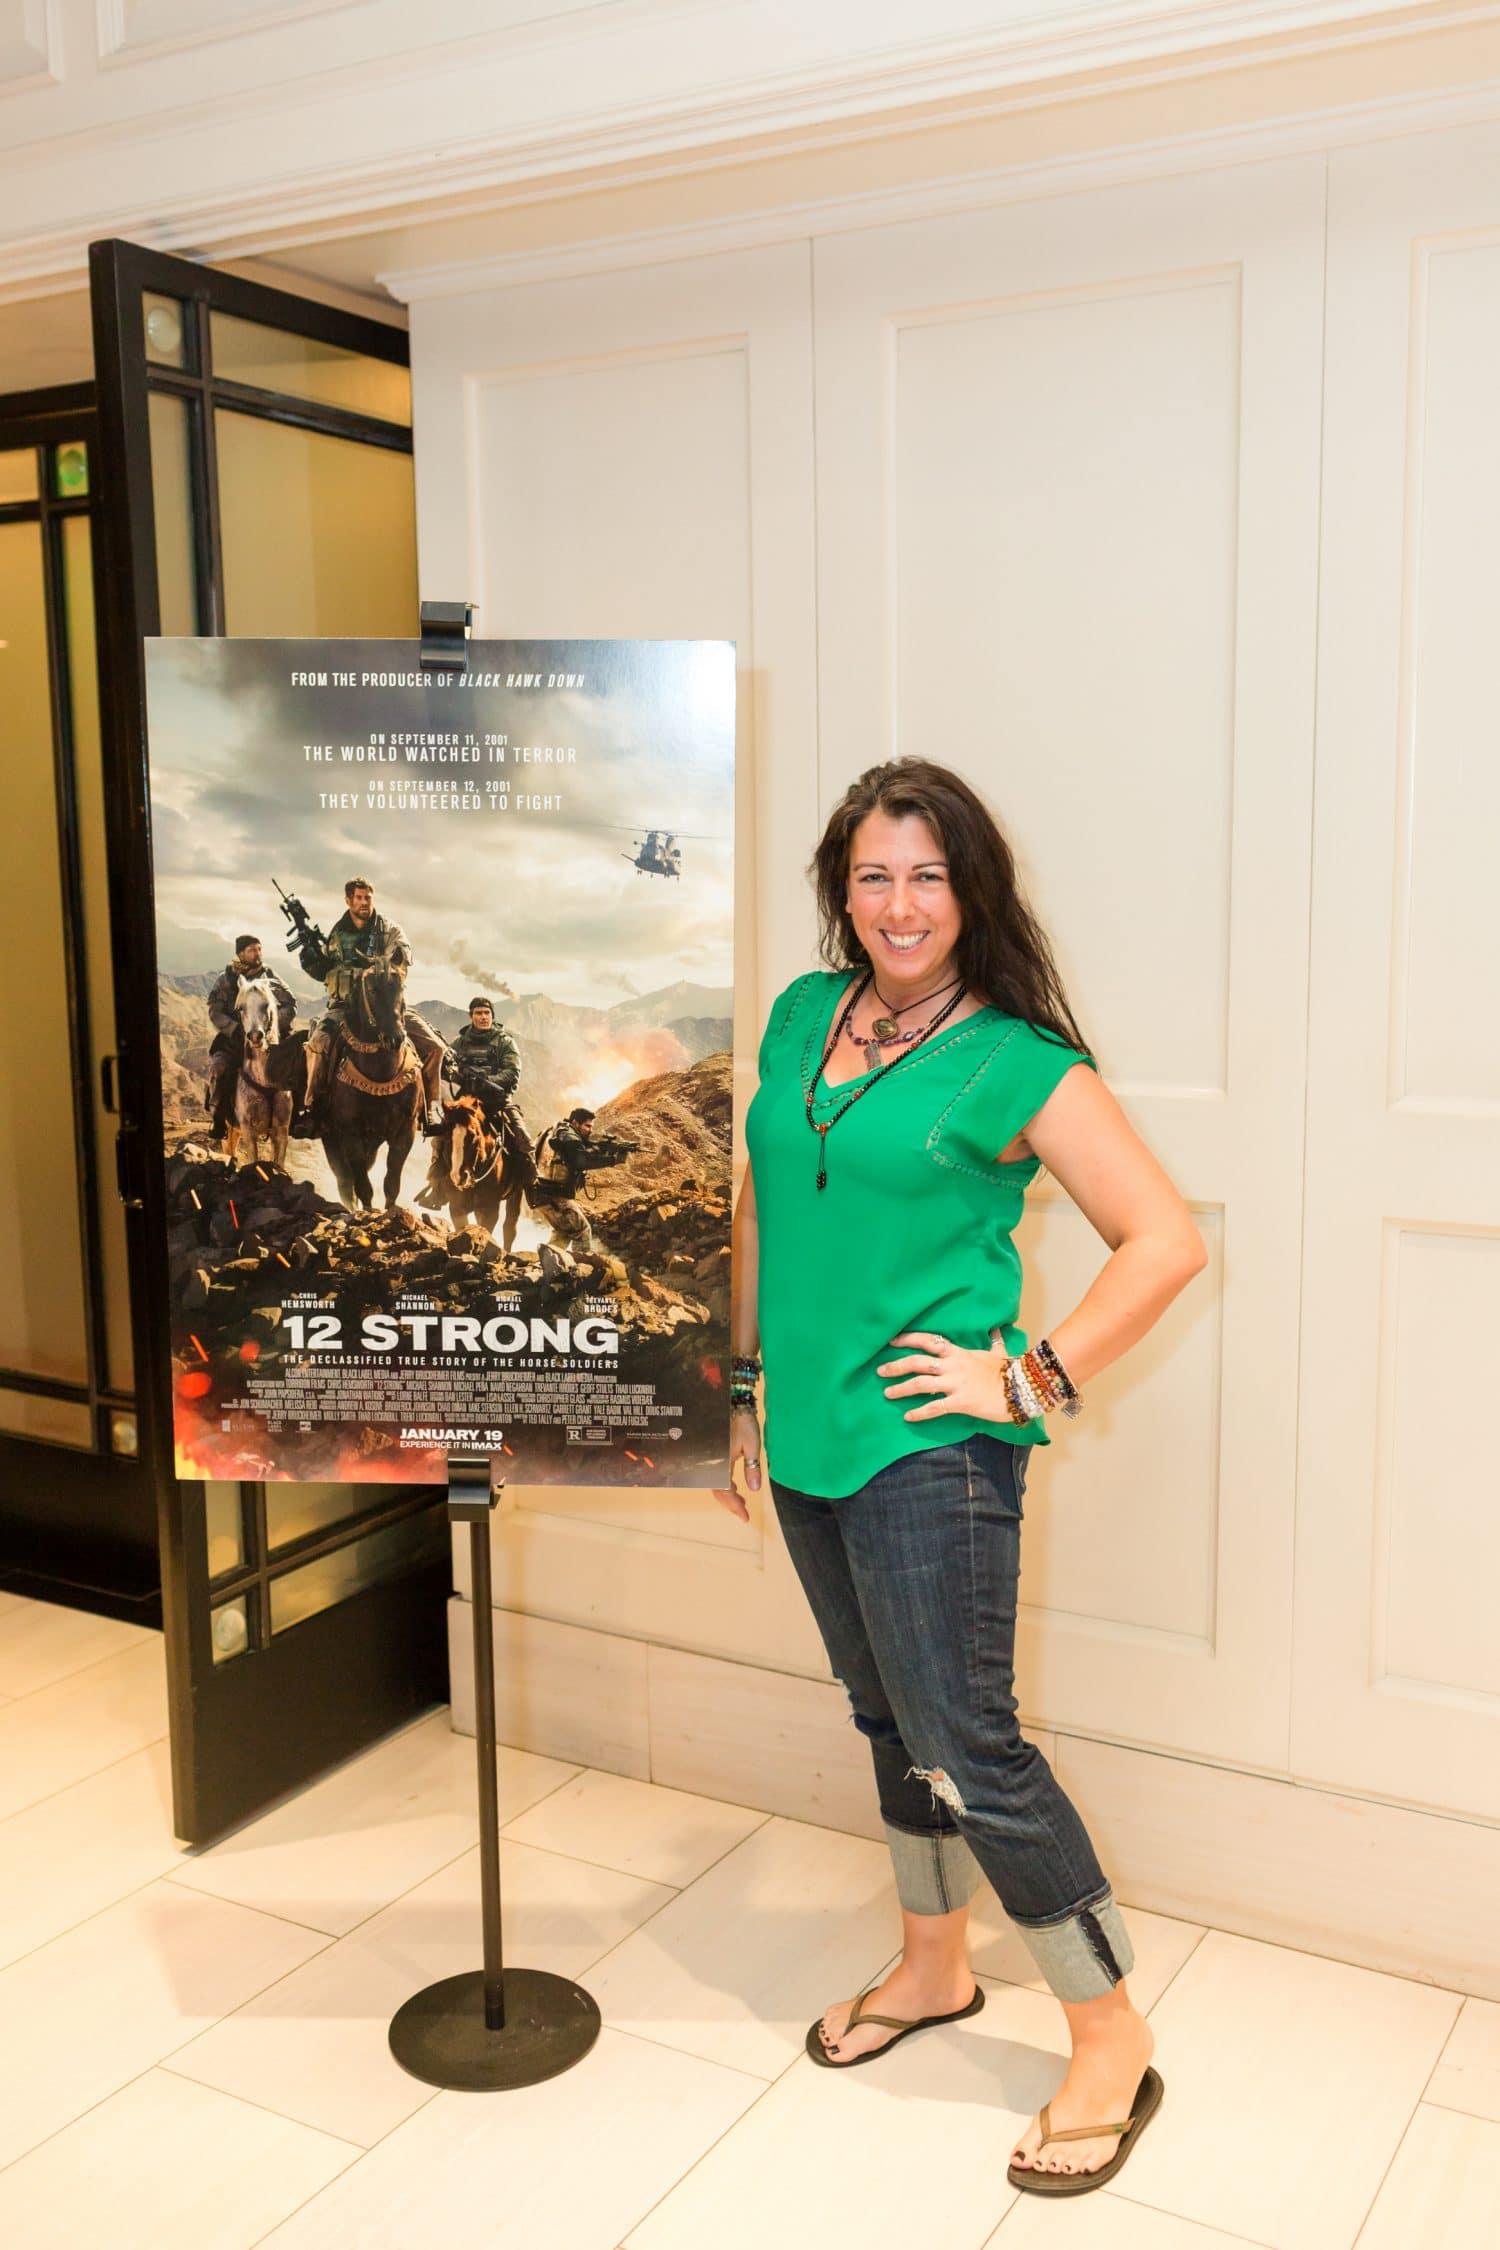 12 Strong press junket movie screening